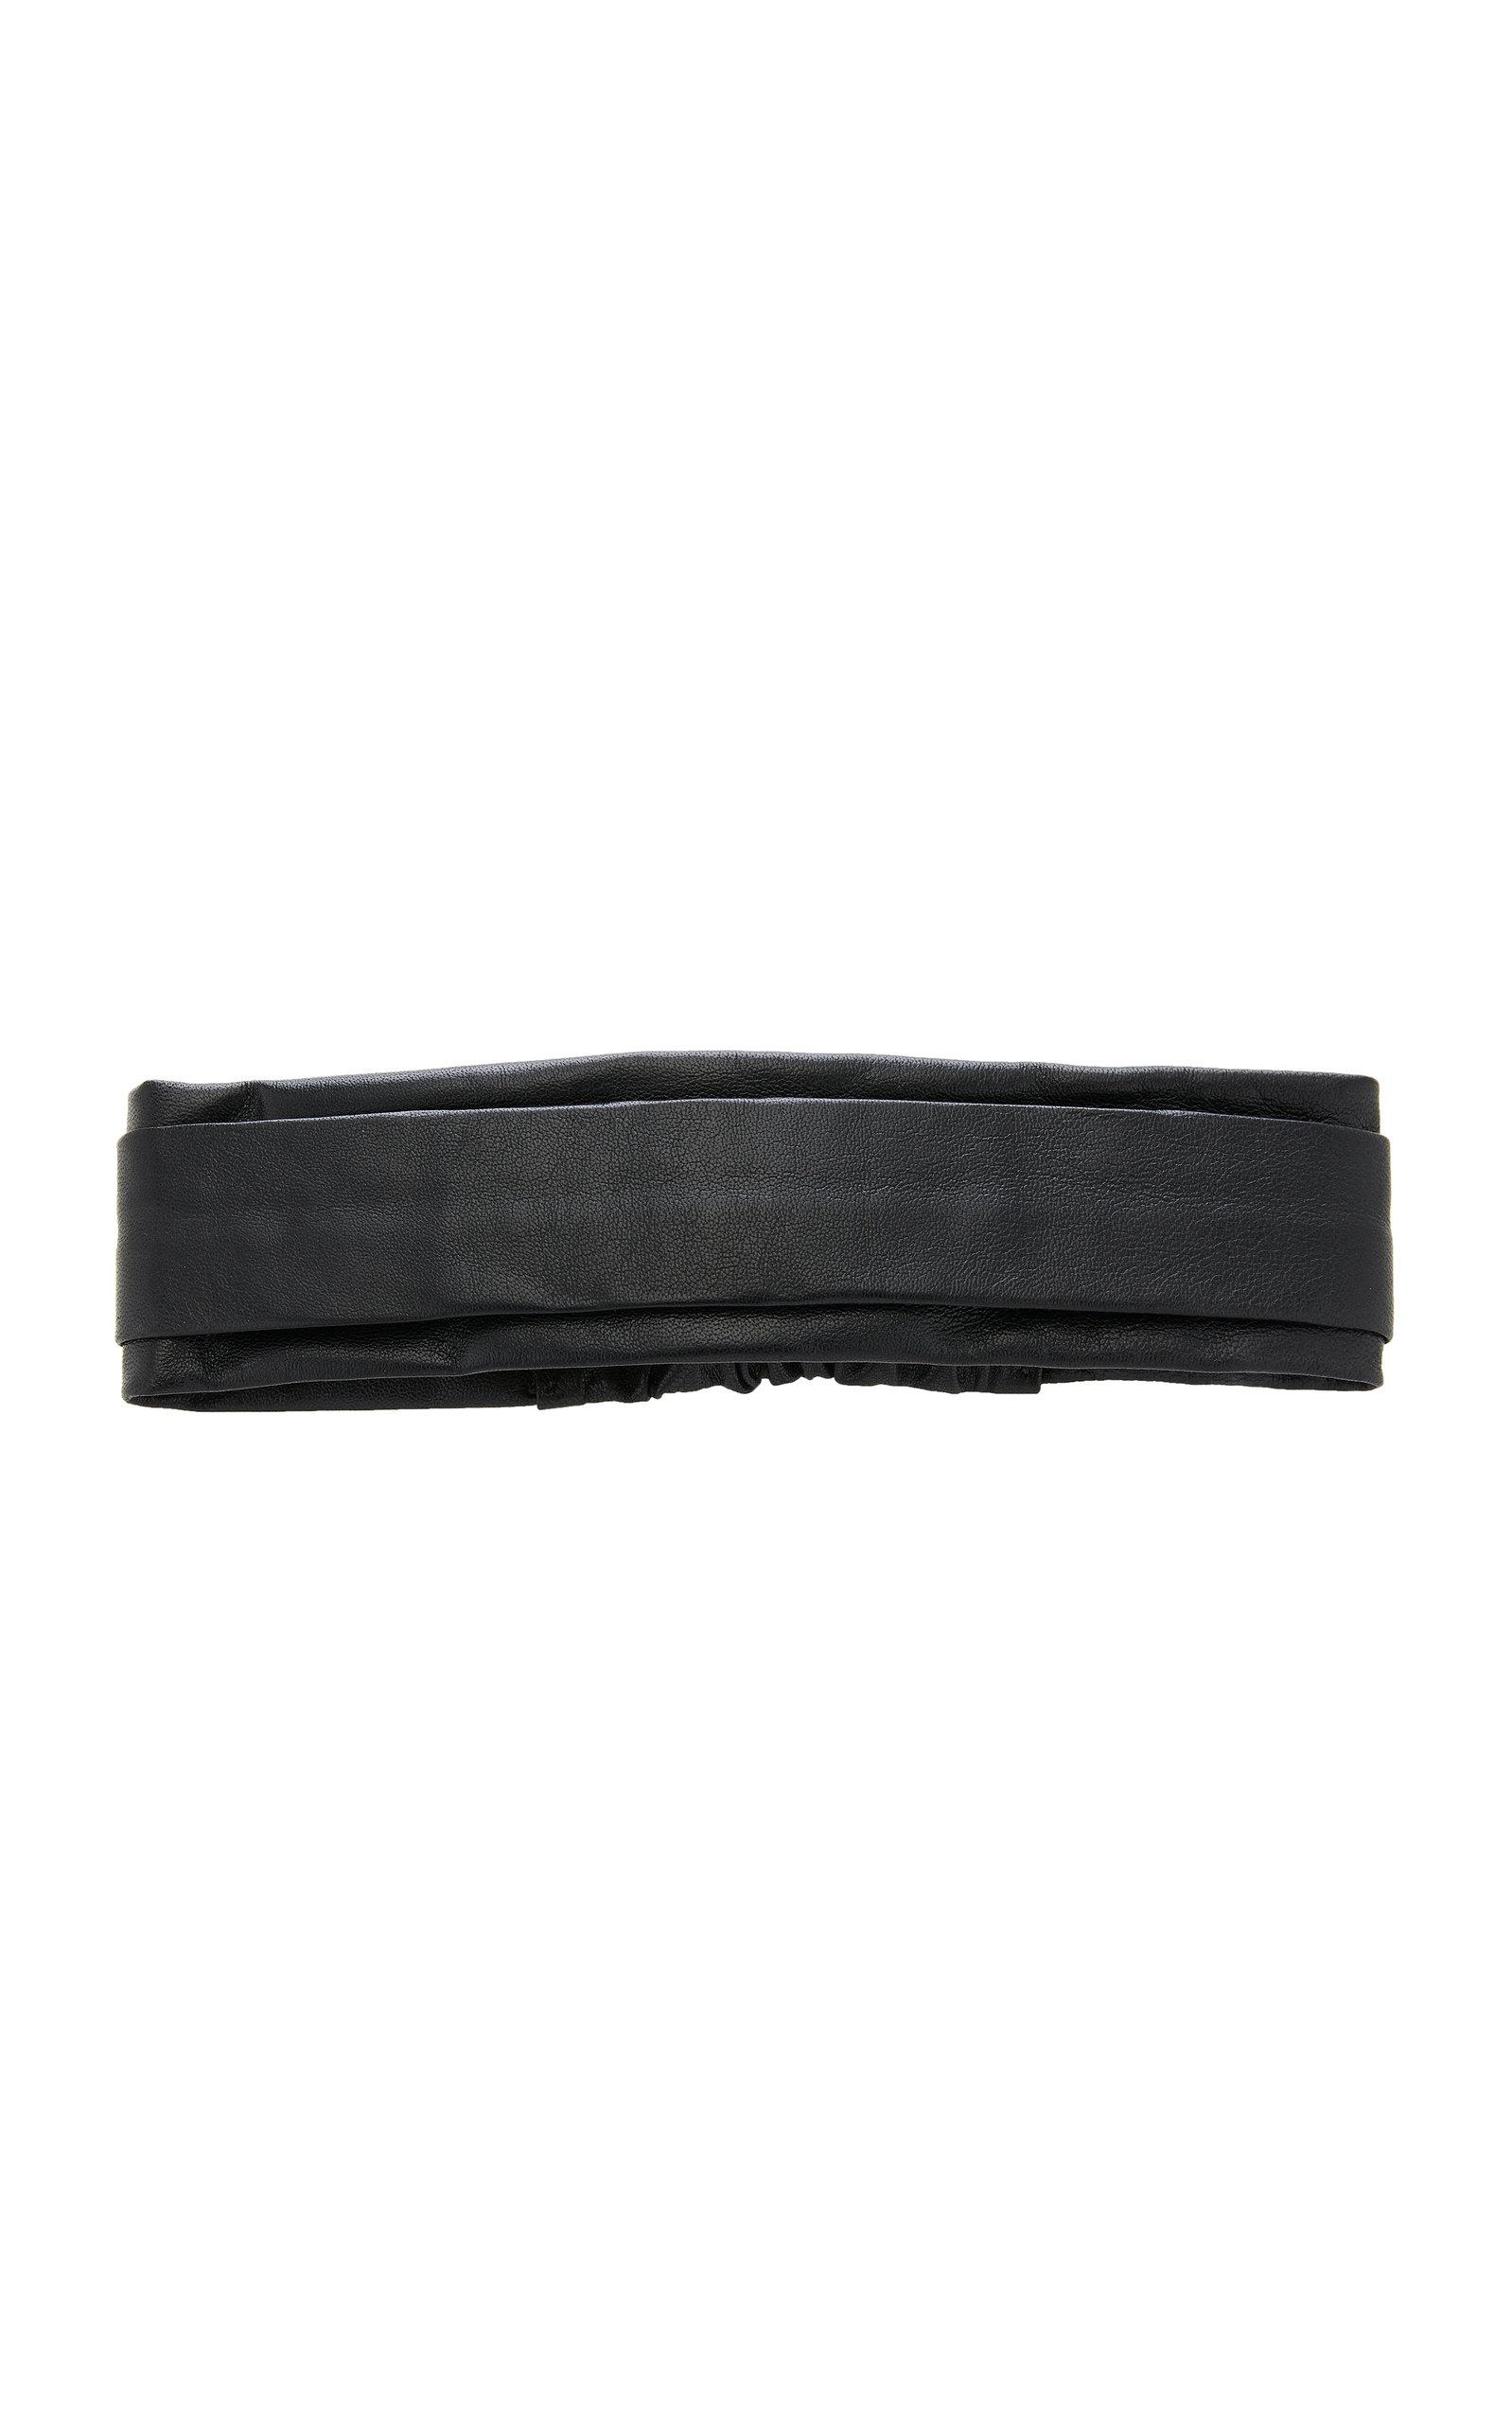 EPONA VALLEY Narrow Leather Headband in Black